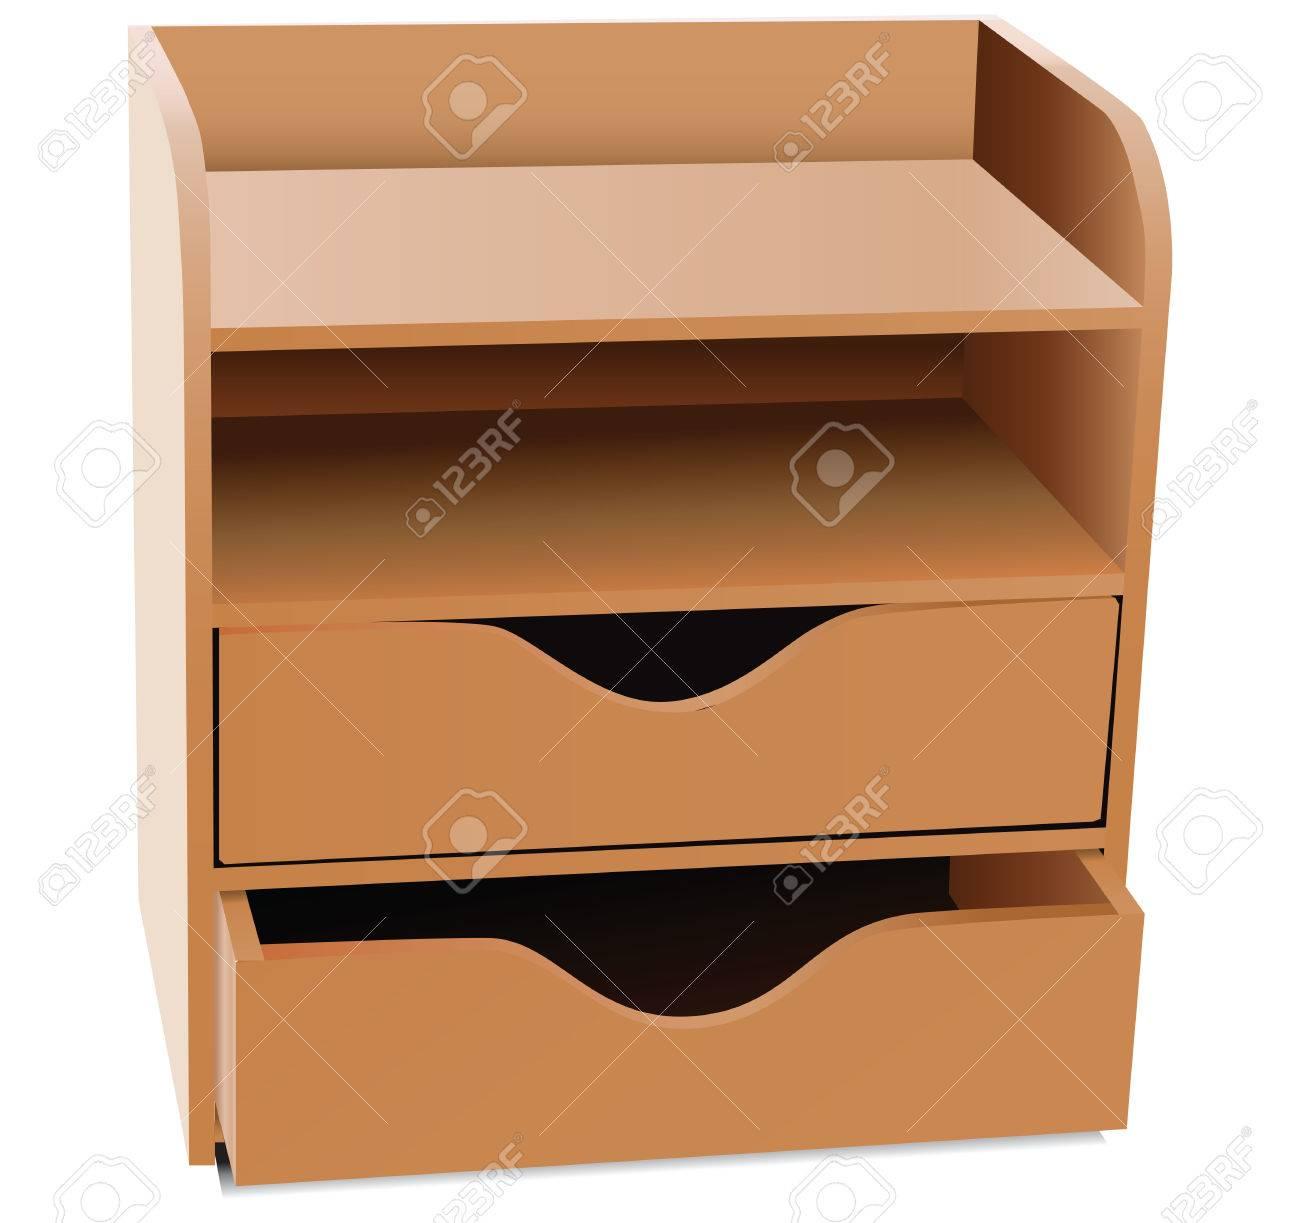 Office Shelves With Drawers Desk Organizer Vector Illustration